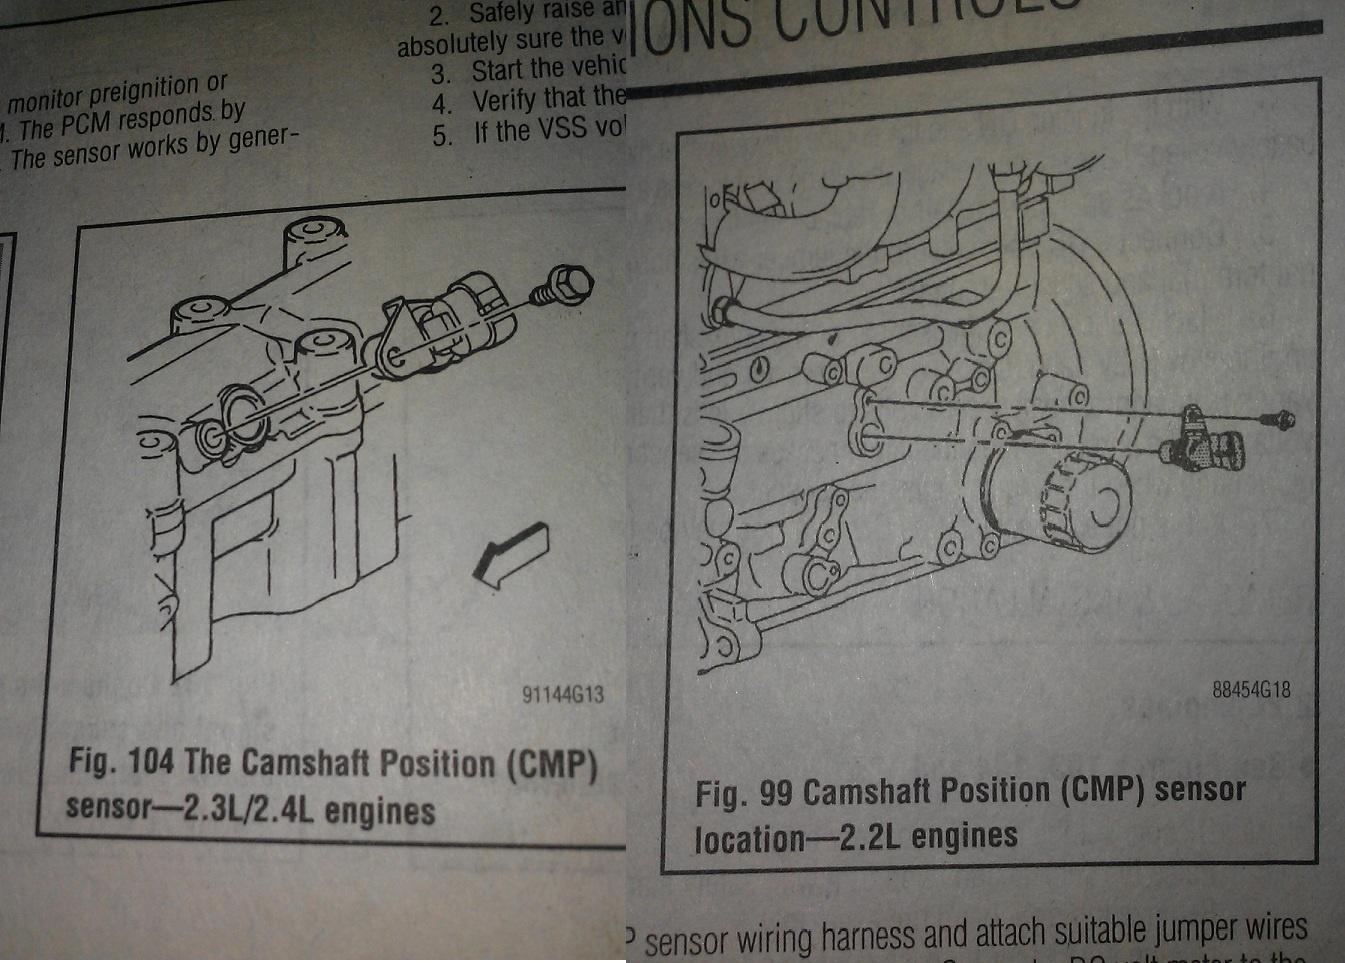 BA_5626] 2001 Pontiac Sunfire Transmission Wiring Diagram Free Diagram | 99 Pontiac Sunfire Engine Diagram |  | Gresi Subd Oupli Weasi Getap Mohammedshrine Librar Wiring 101